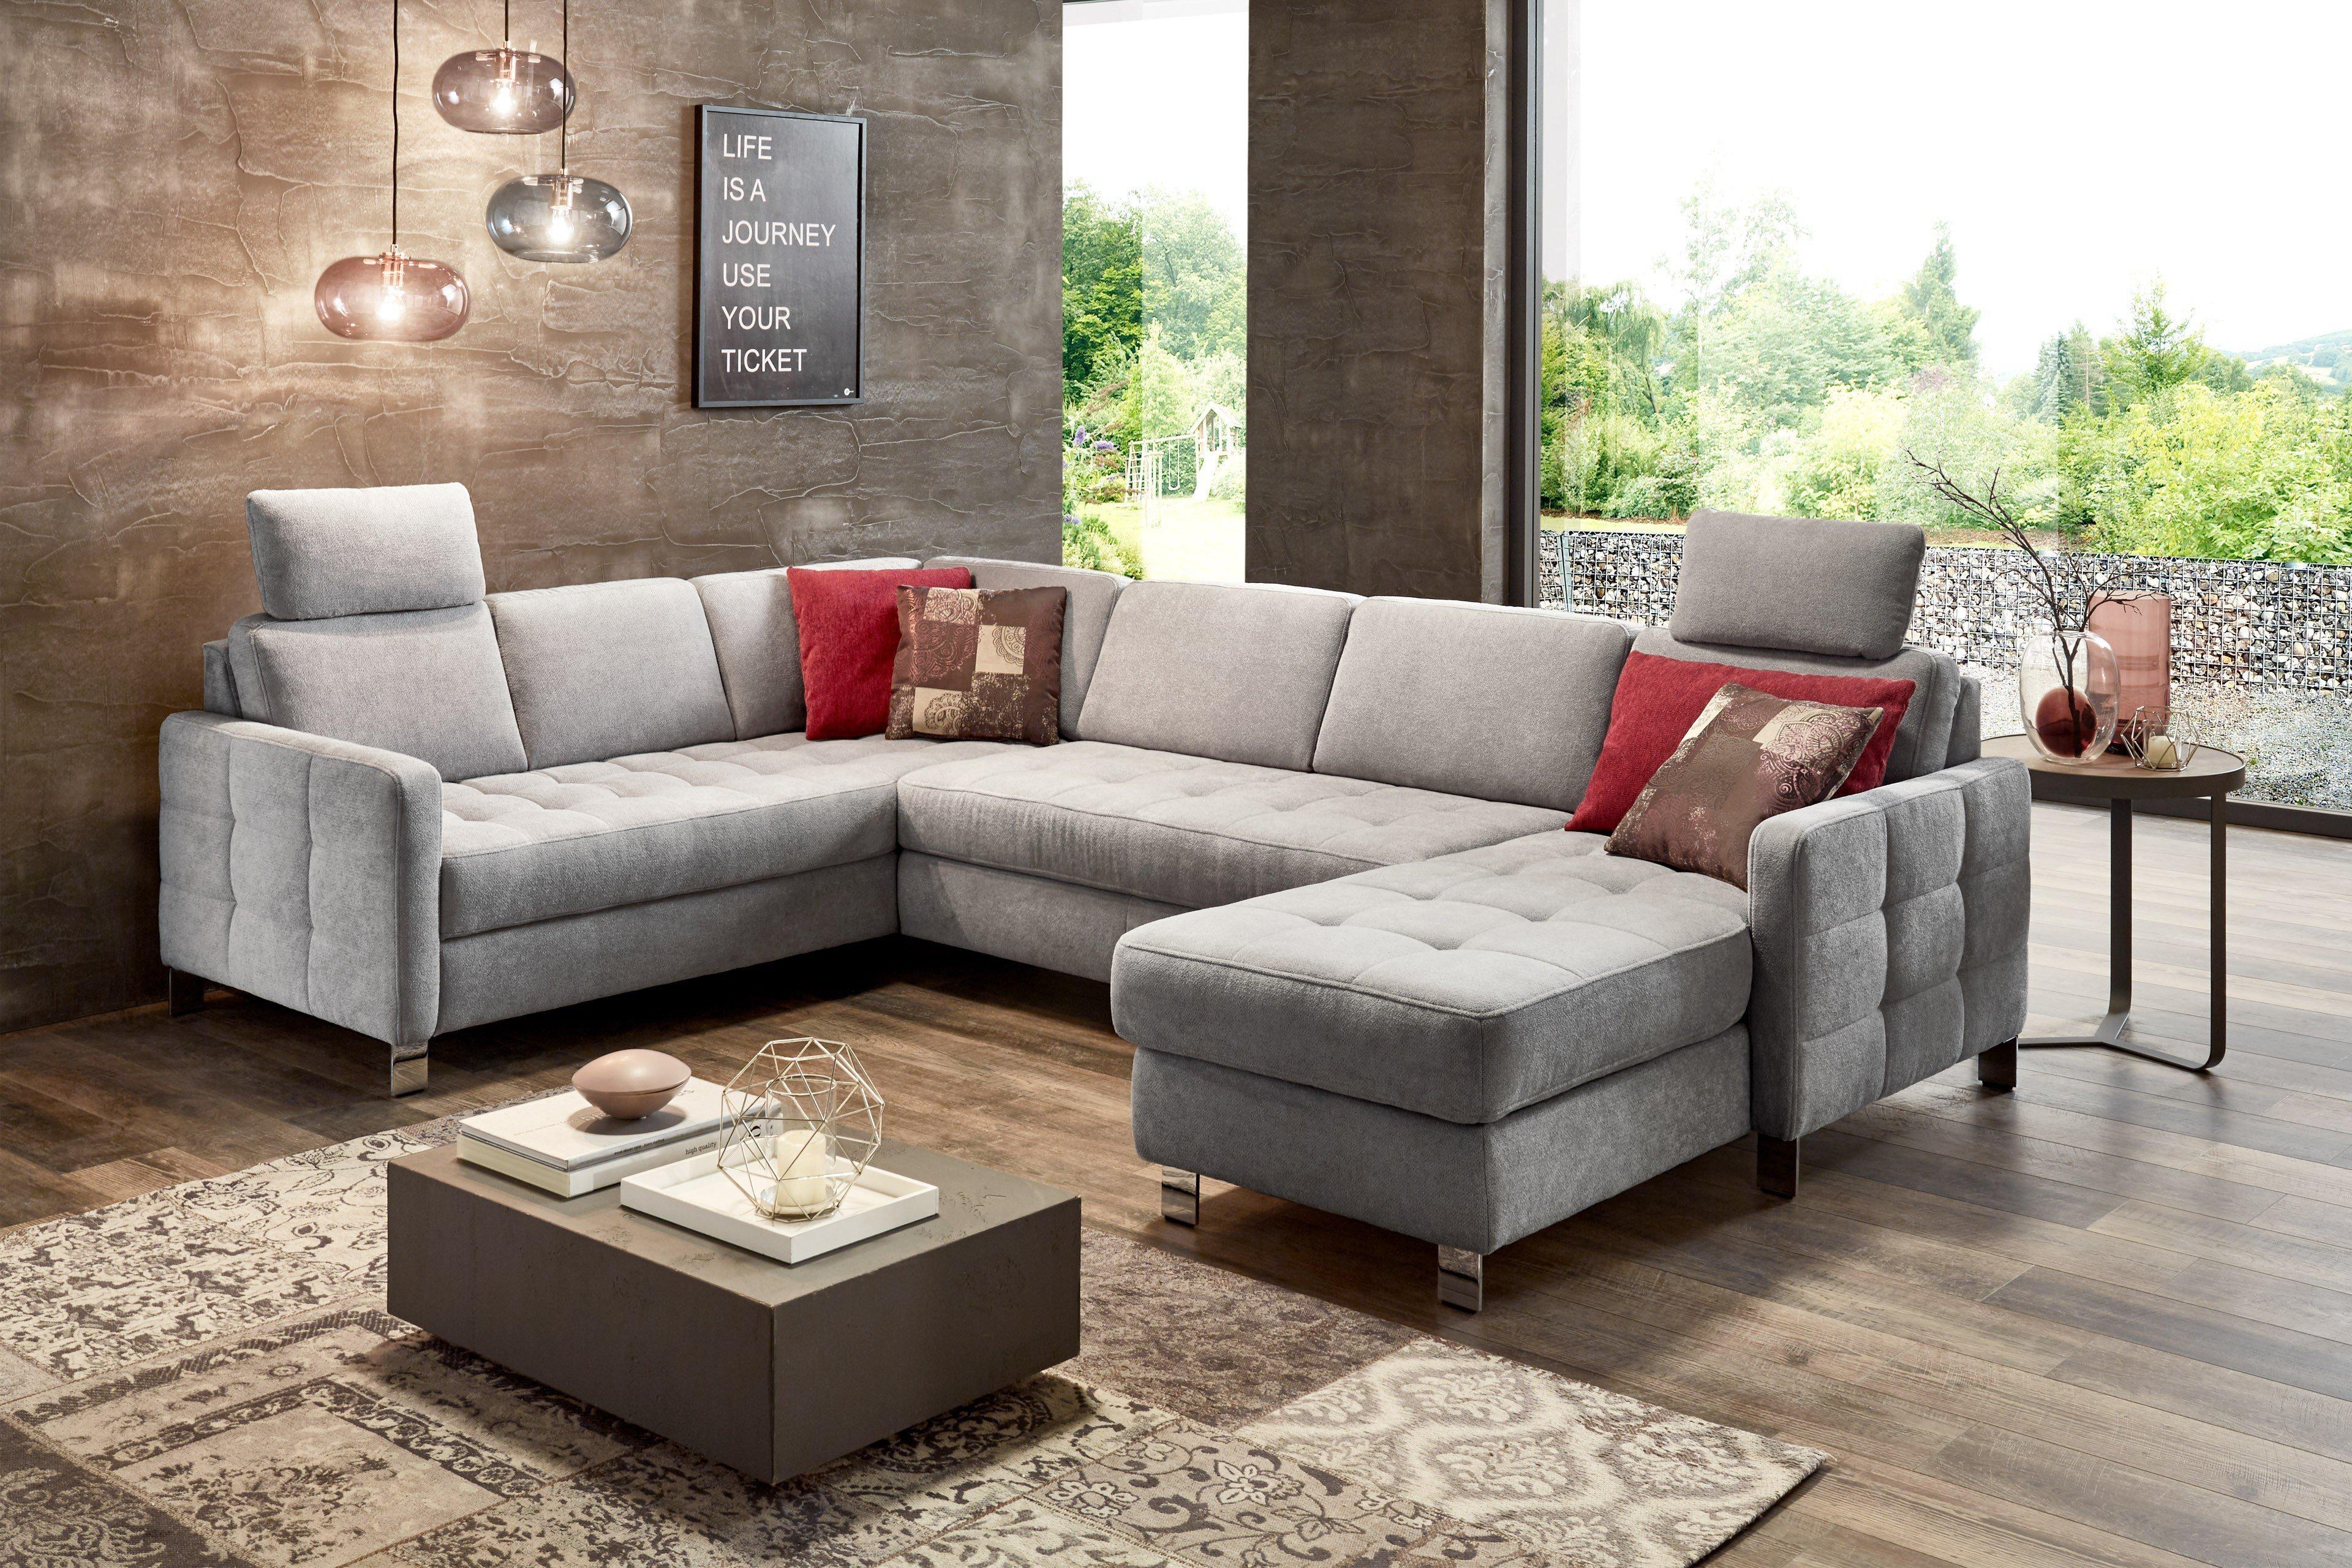 wohnlandschaft hellgrau. Black Bedroom Furniture Sets. Home Design Ideas